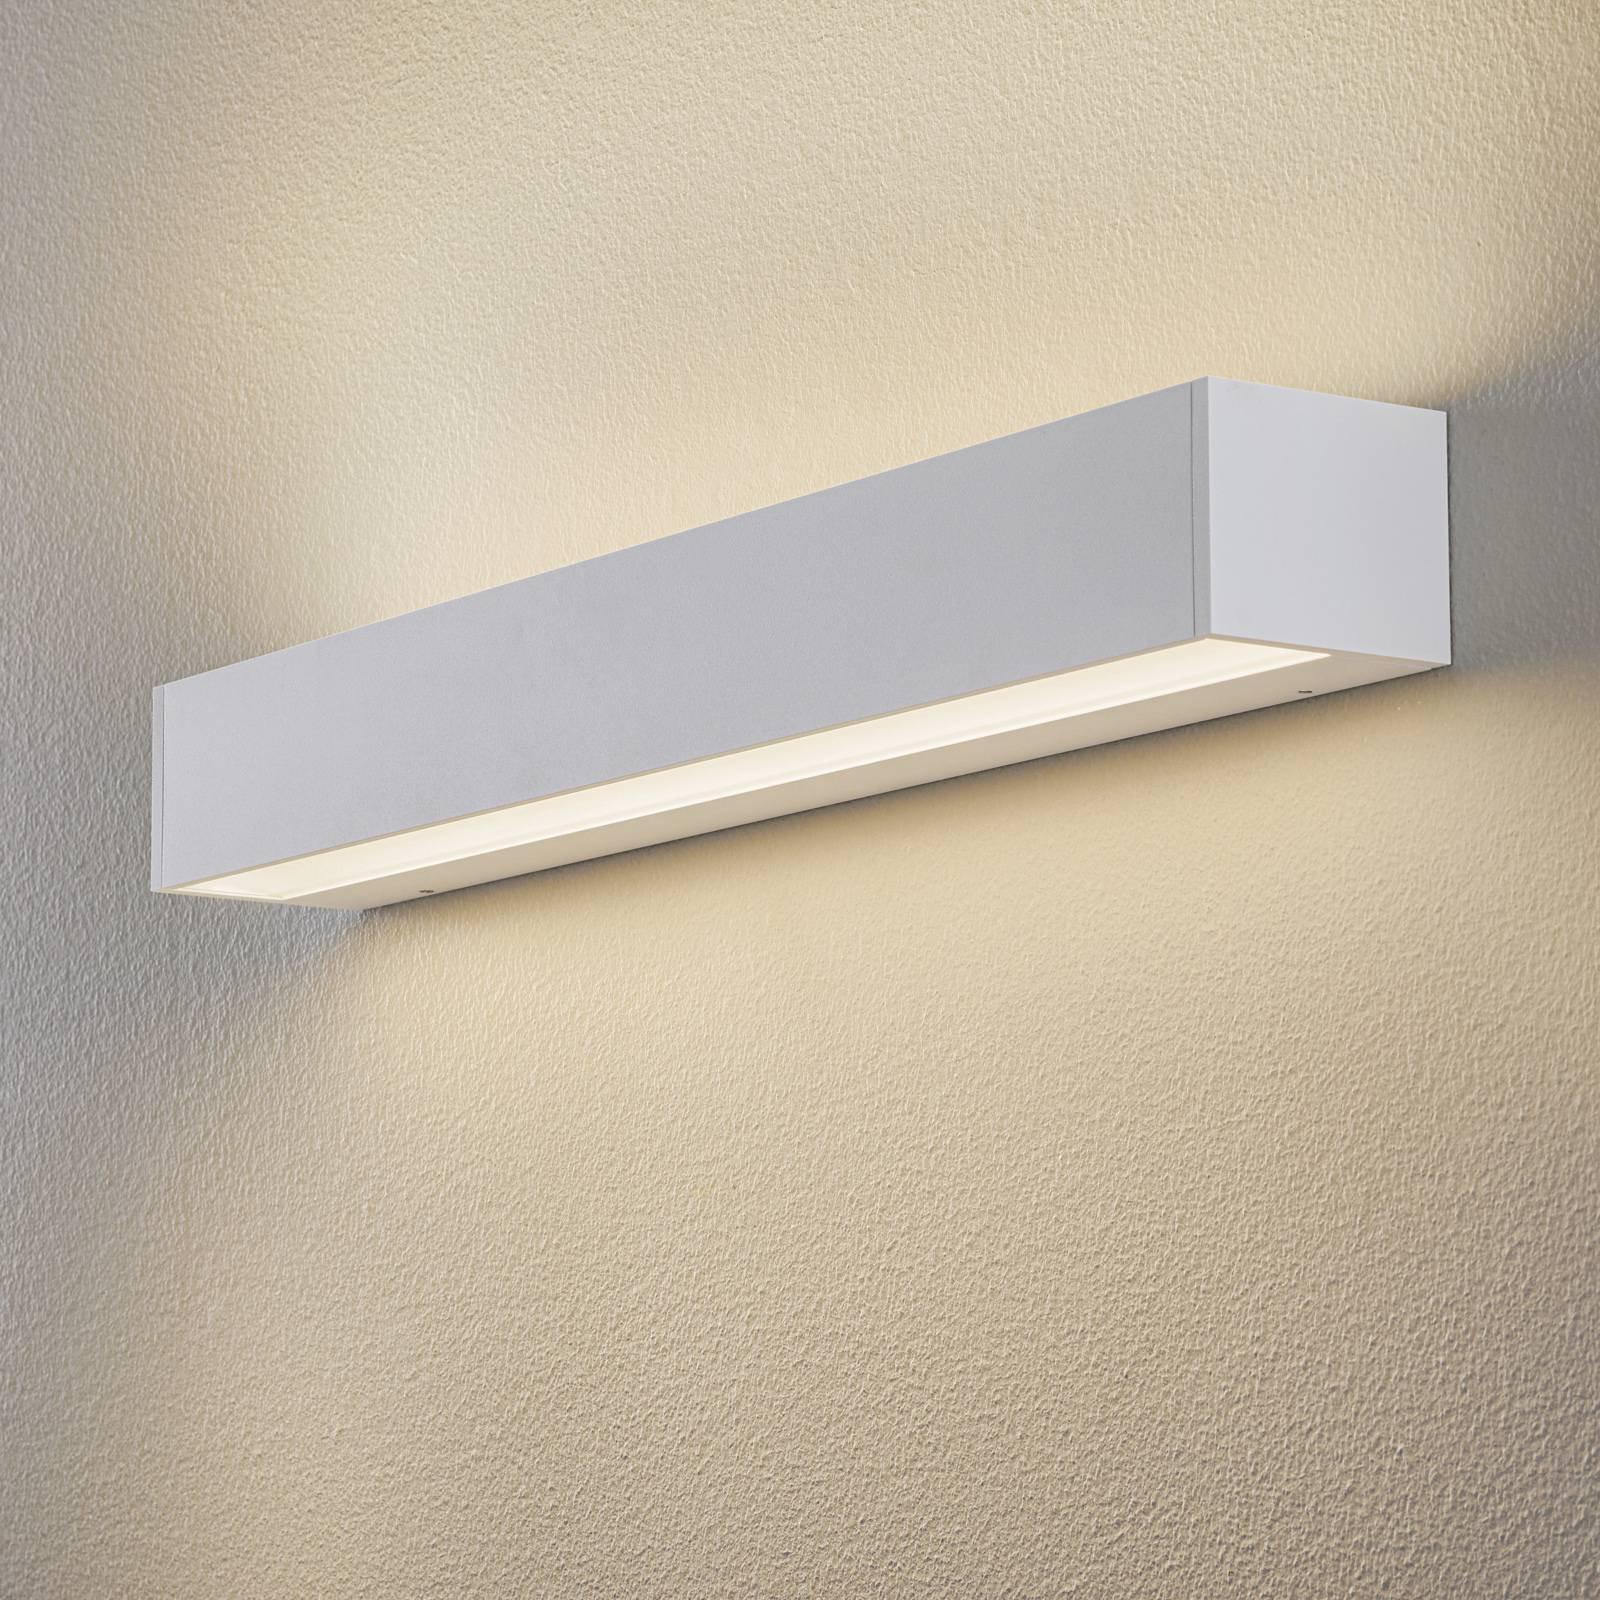 BEGA 50804 LED-vegglampe 930 hvit 62 cm 6180 lm